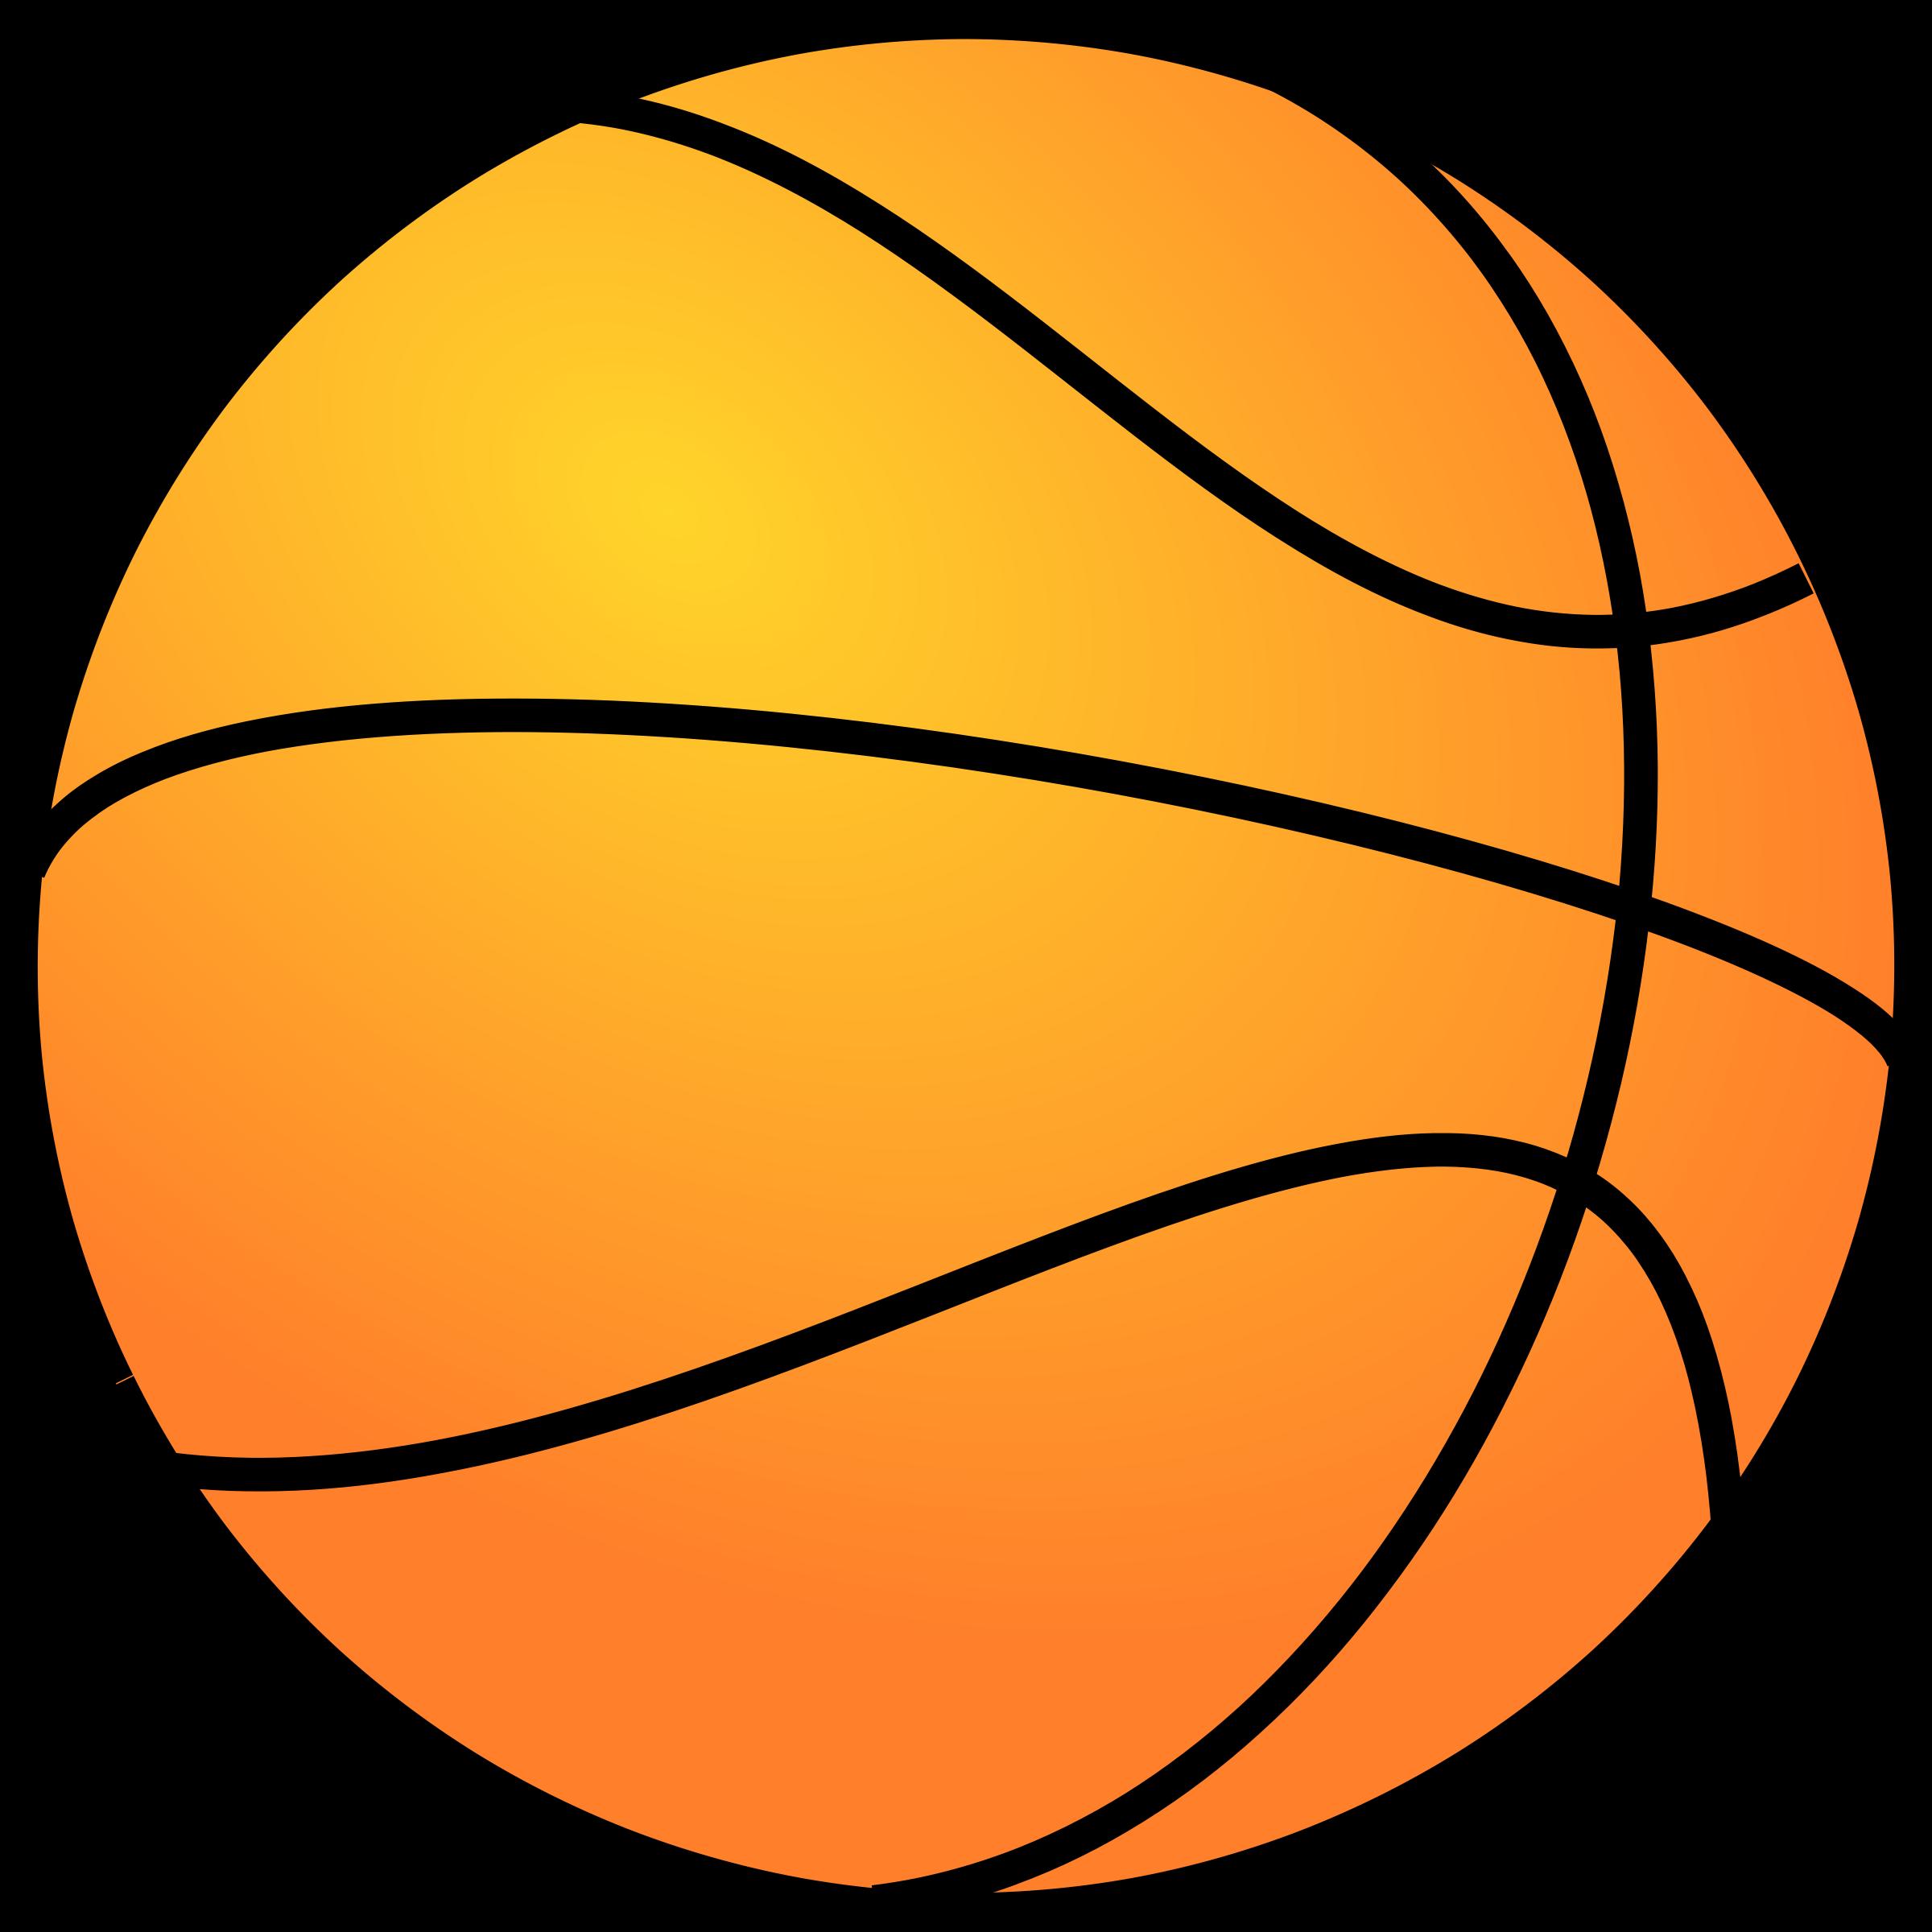 pin Wallpaper clipart basketball #11 - Basketball HD PNG - Basketball Net PNG HD